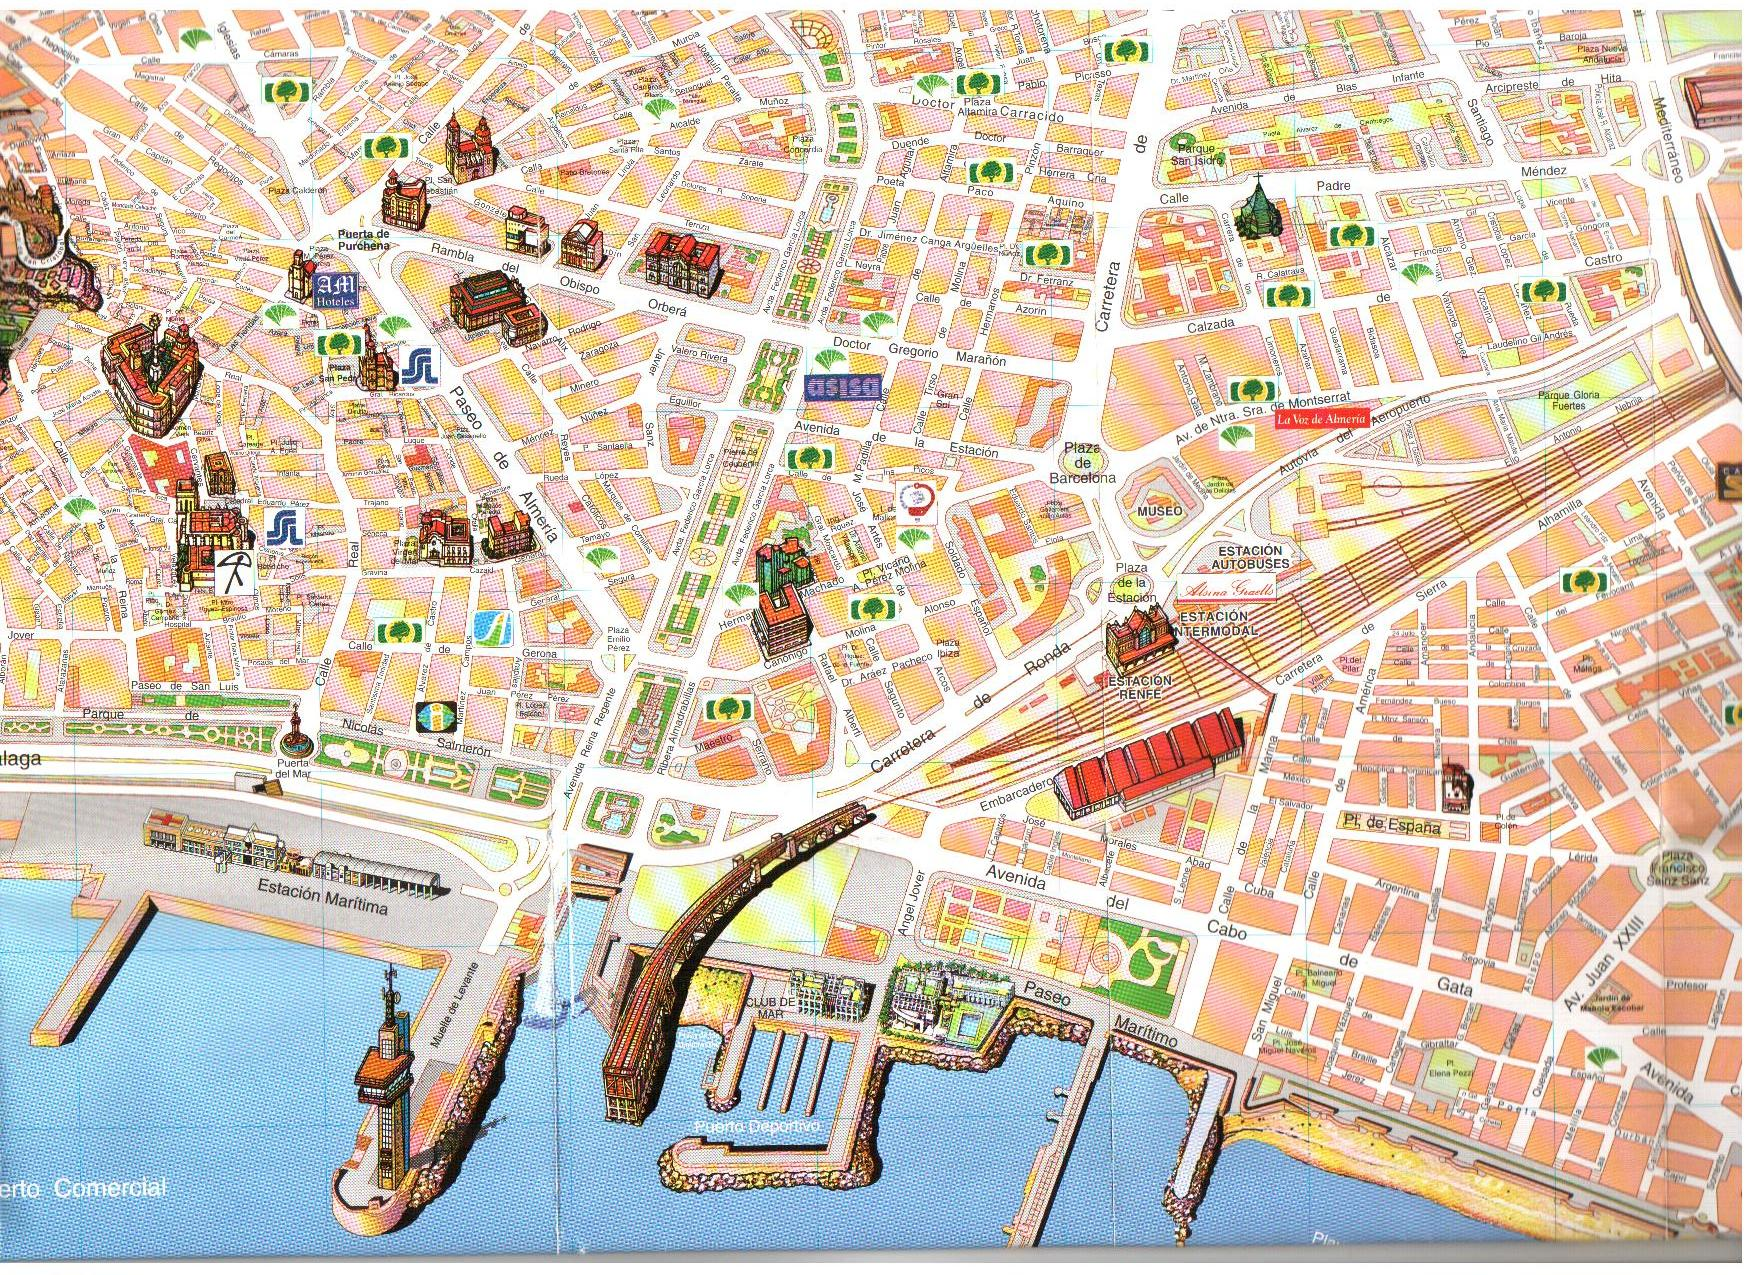 Mapa de de Almería